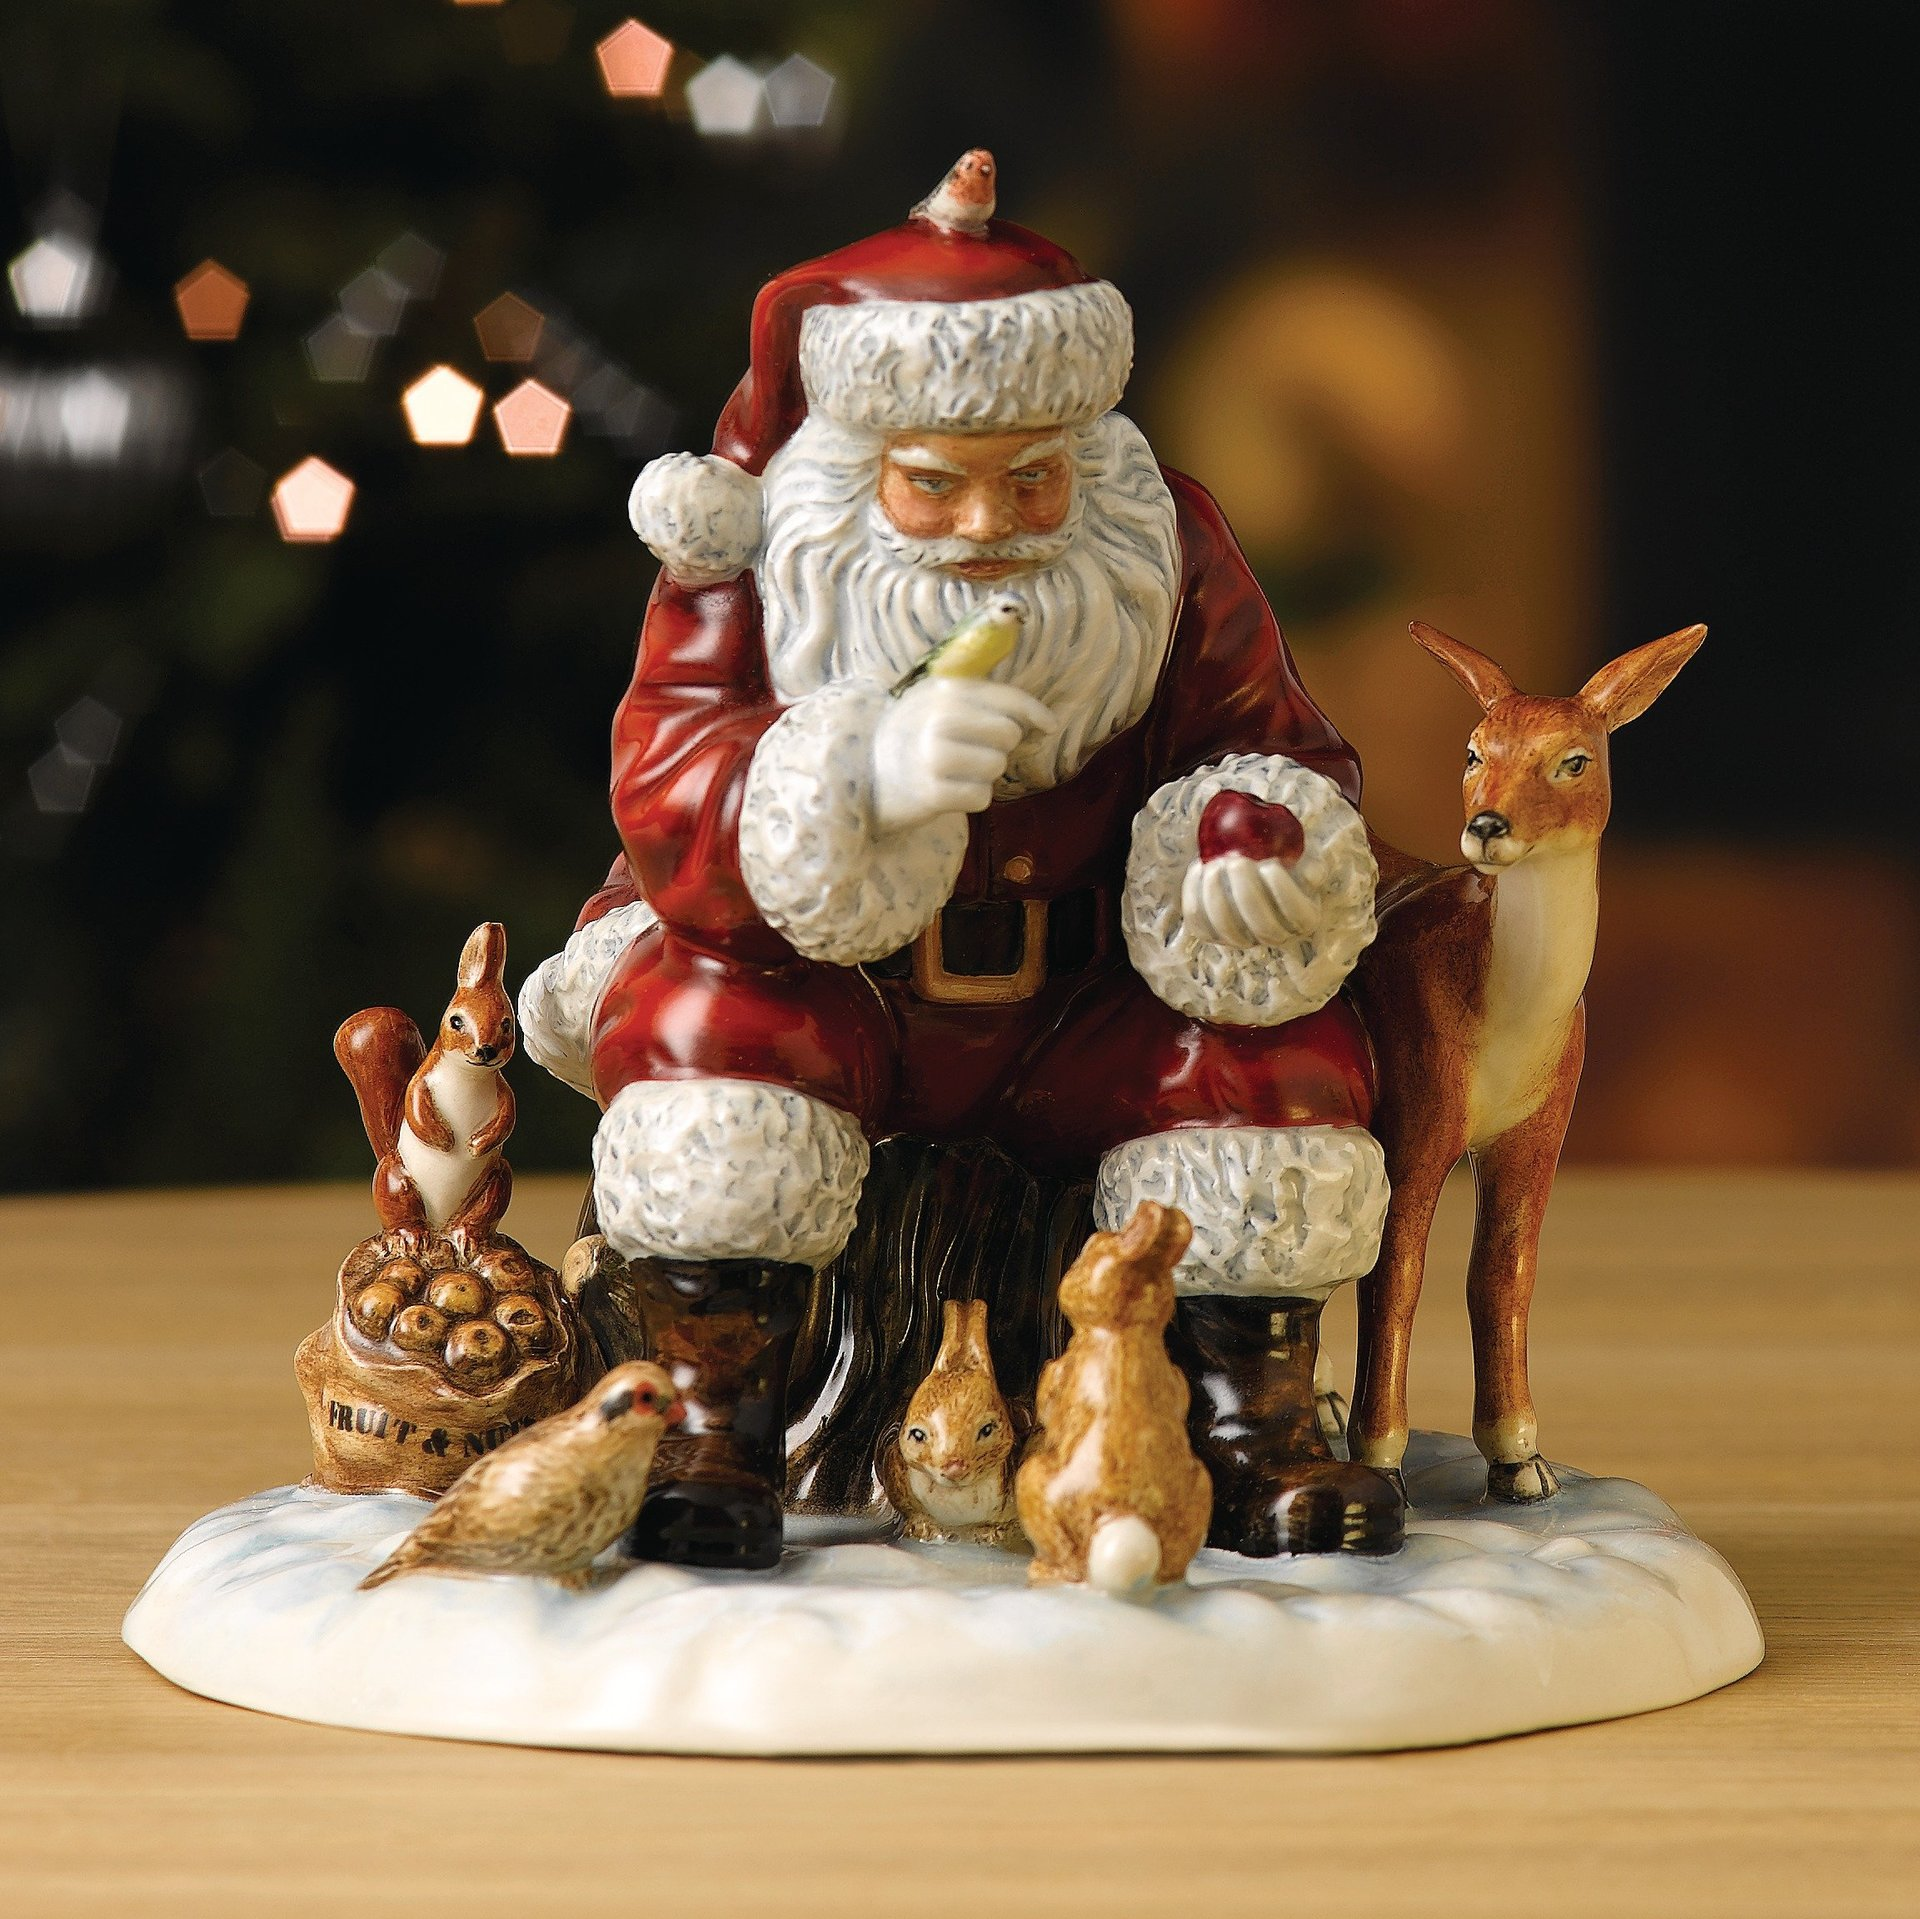 ROYAL DOULTON 2017 ANNUAL FATHER CHRISTMAS